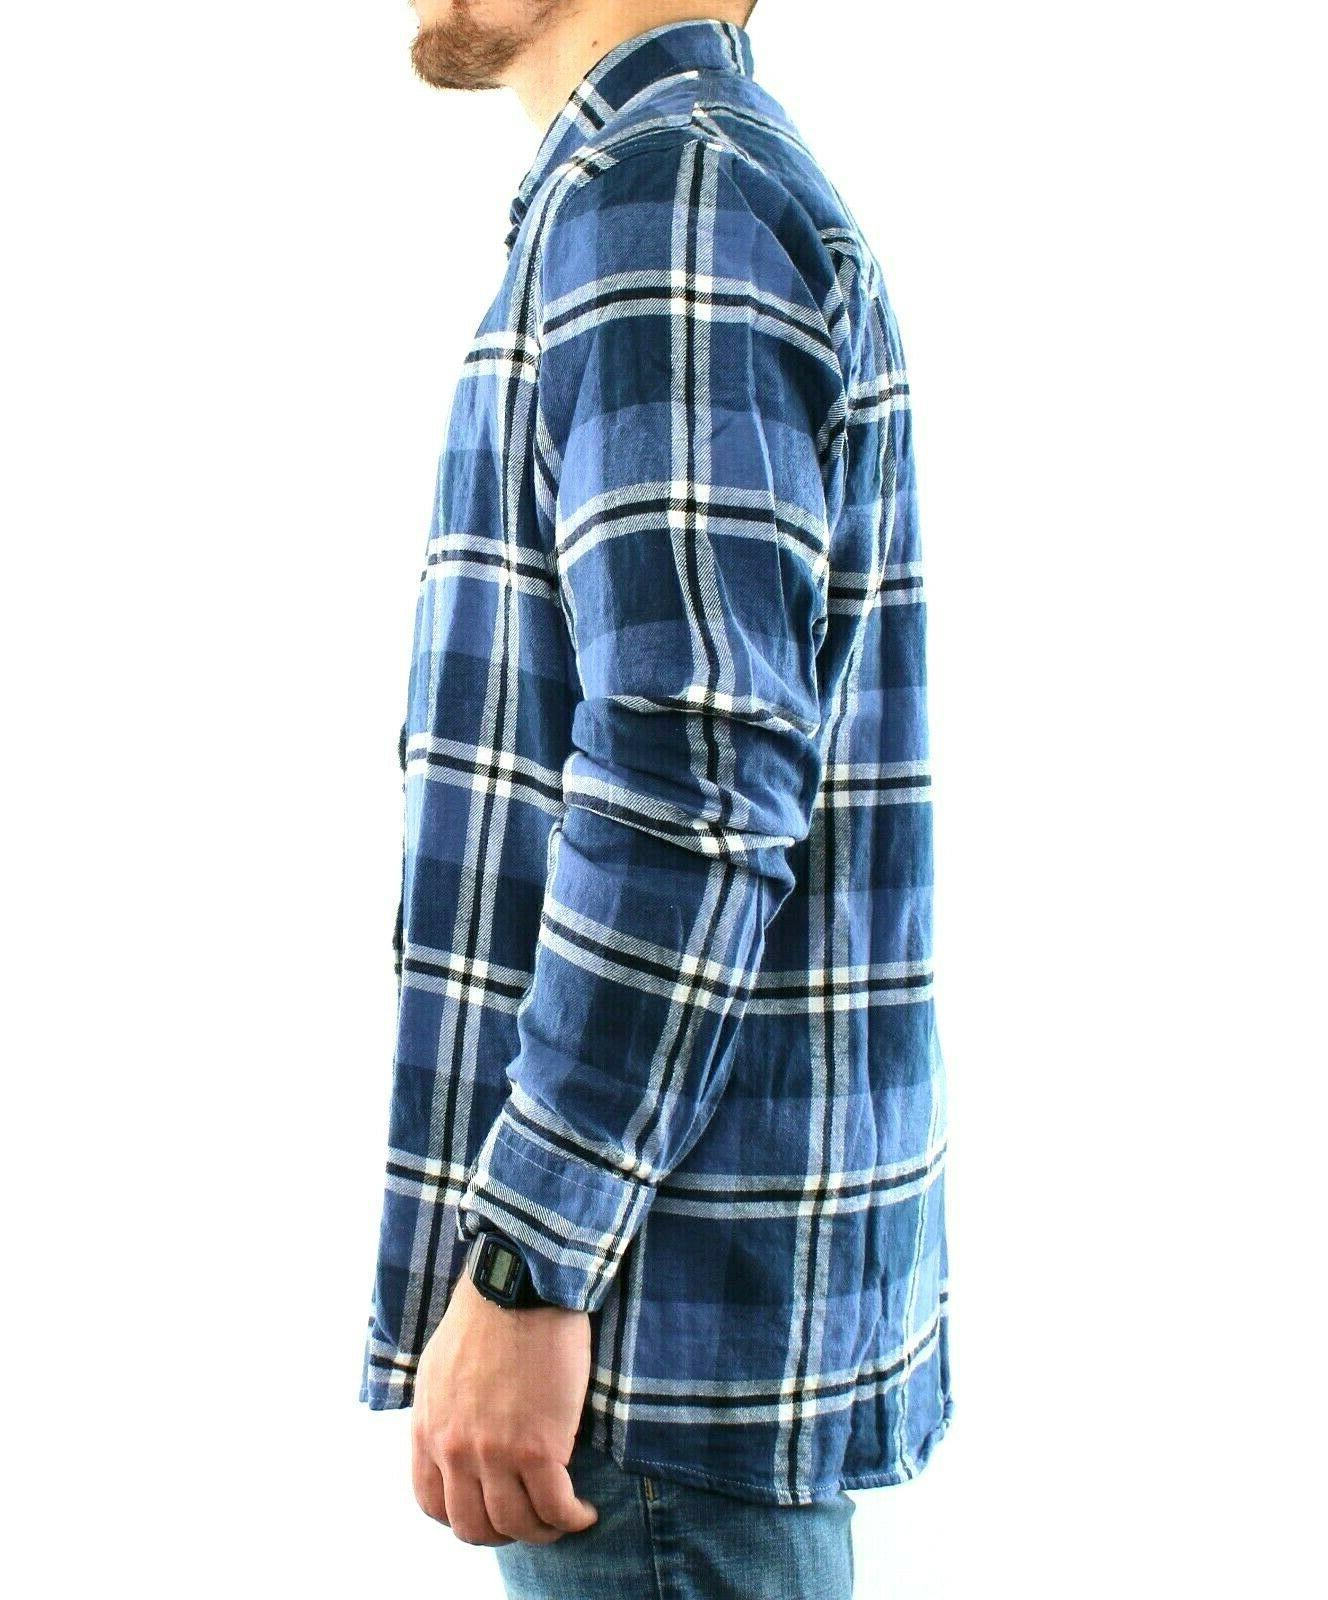 St. Johns Flannel Shirt Men's Plaid Sleeve Button